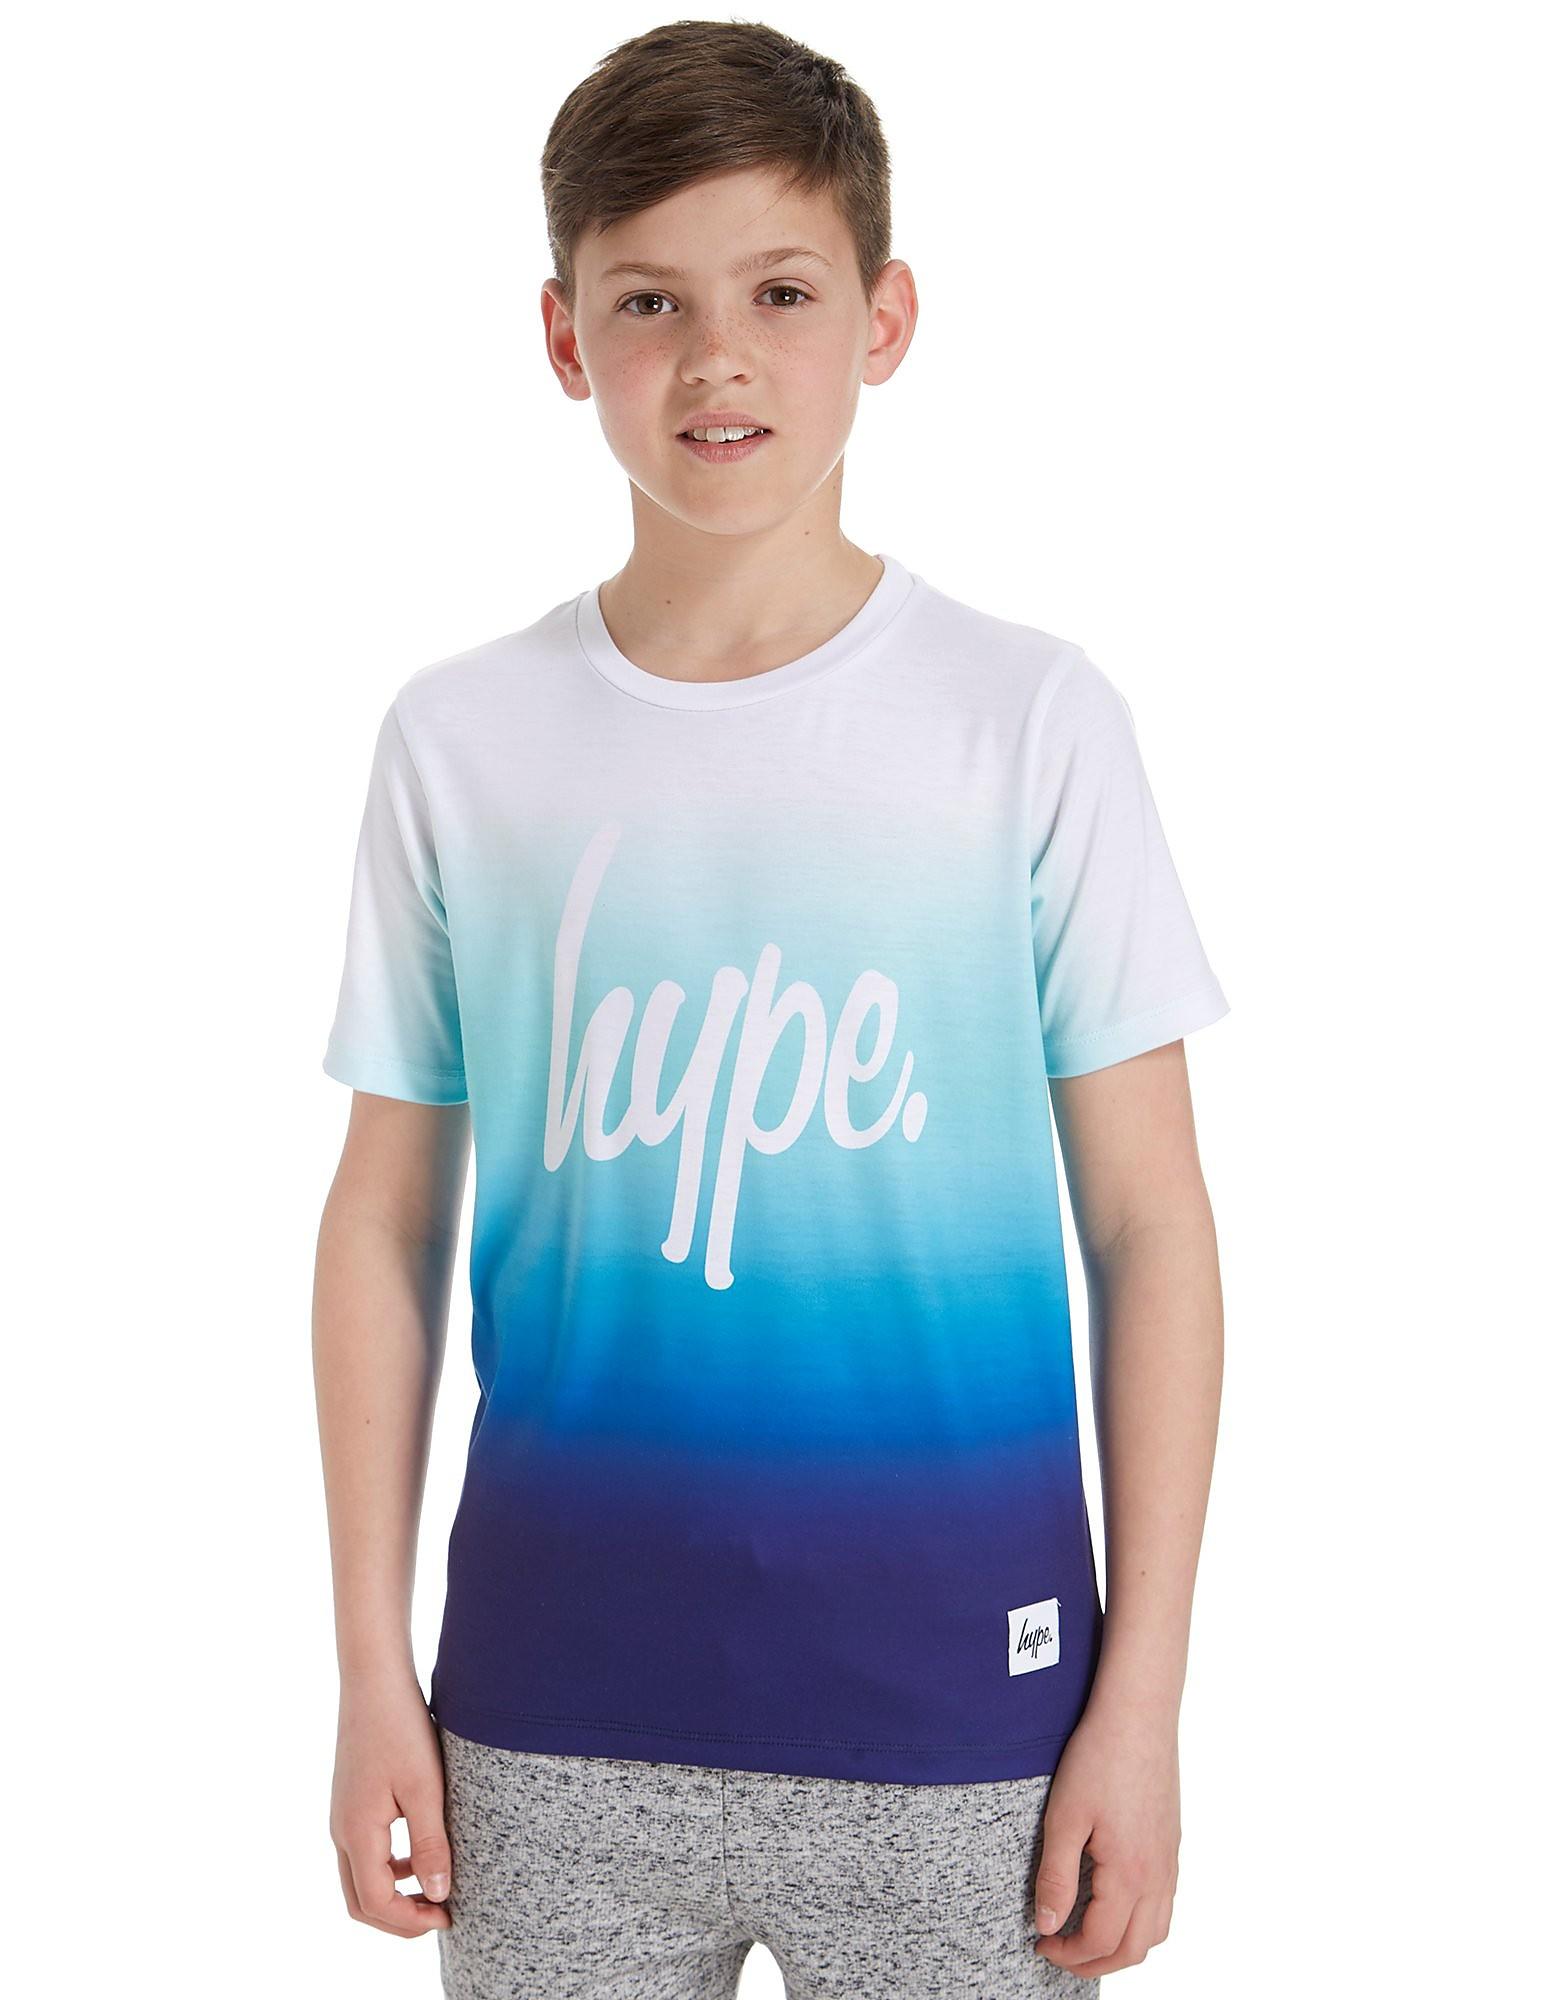 Hype Fade T-Shirt für Kinder